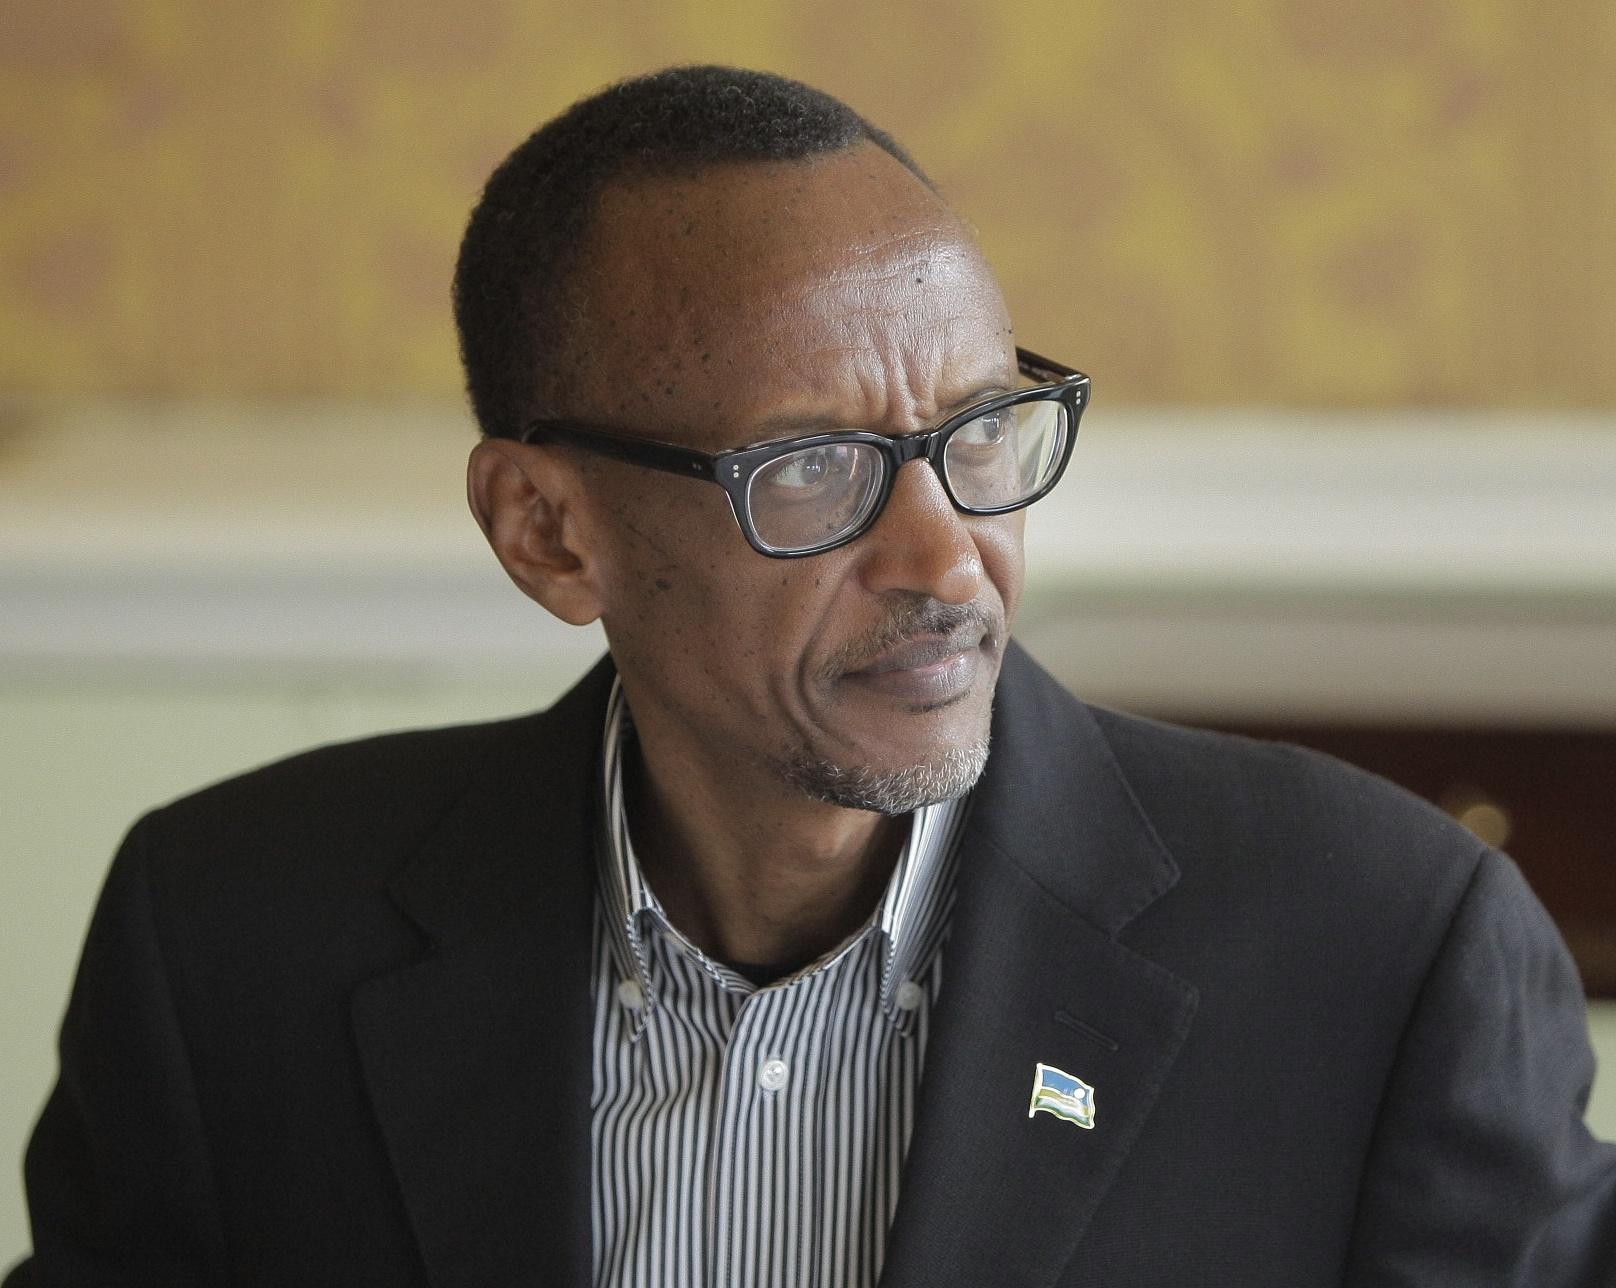 В 2000 году Кагаме отстранил президента от власти, взяв на себя полномочия главы государства